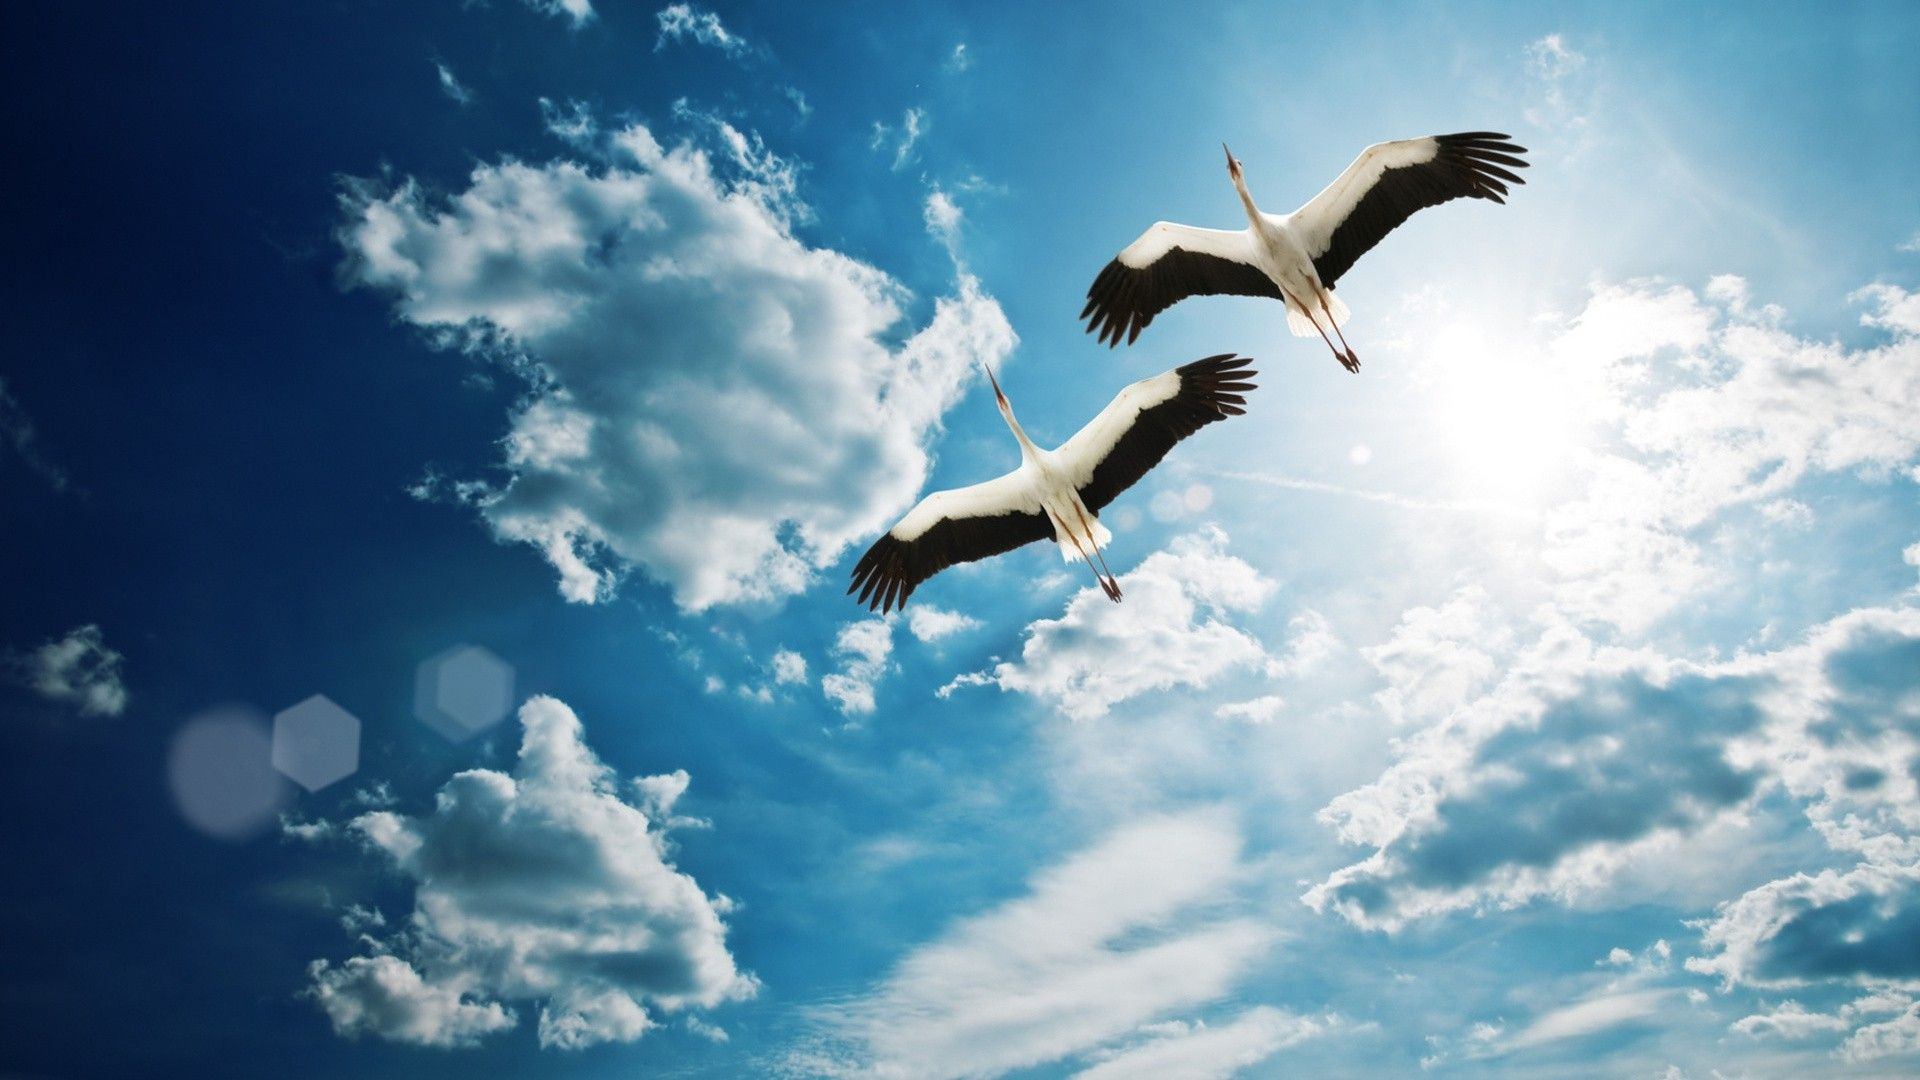 Картинки по запросу птица в небе | Летающая птица, Обои с птицами ...